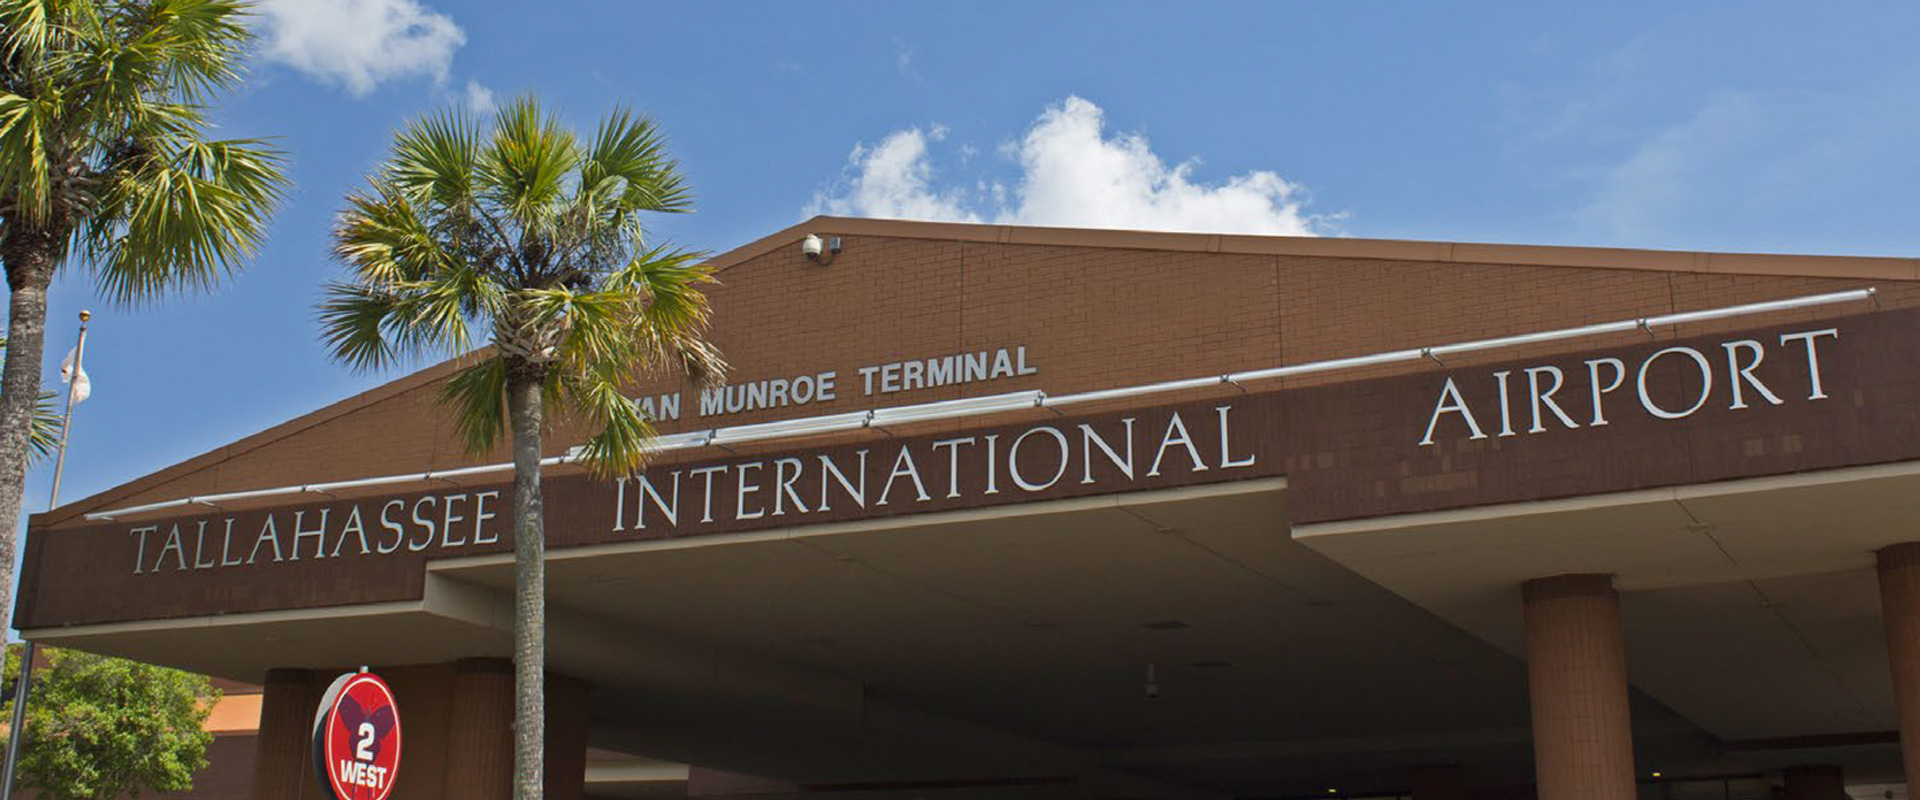 Tallahassee International Airport | Tallahassee